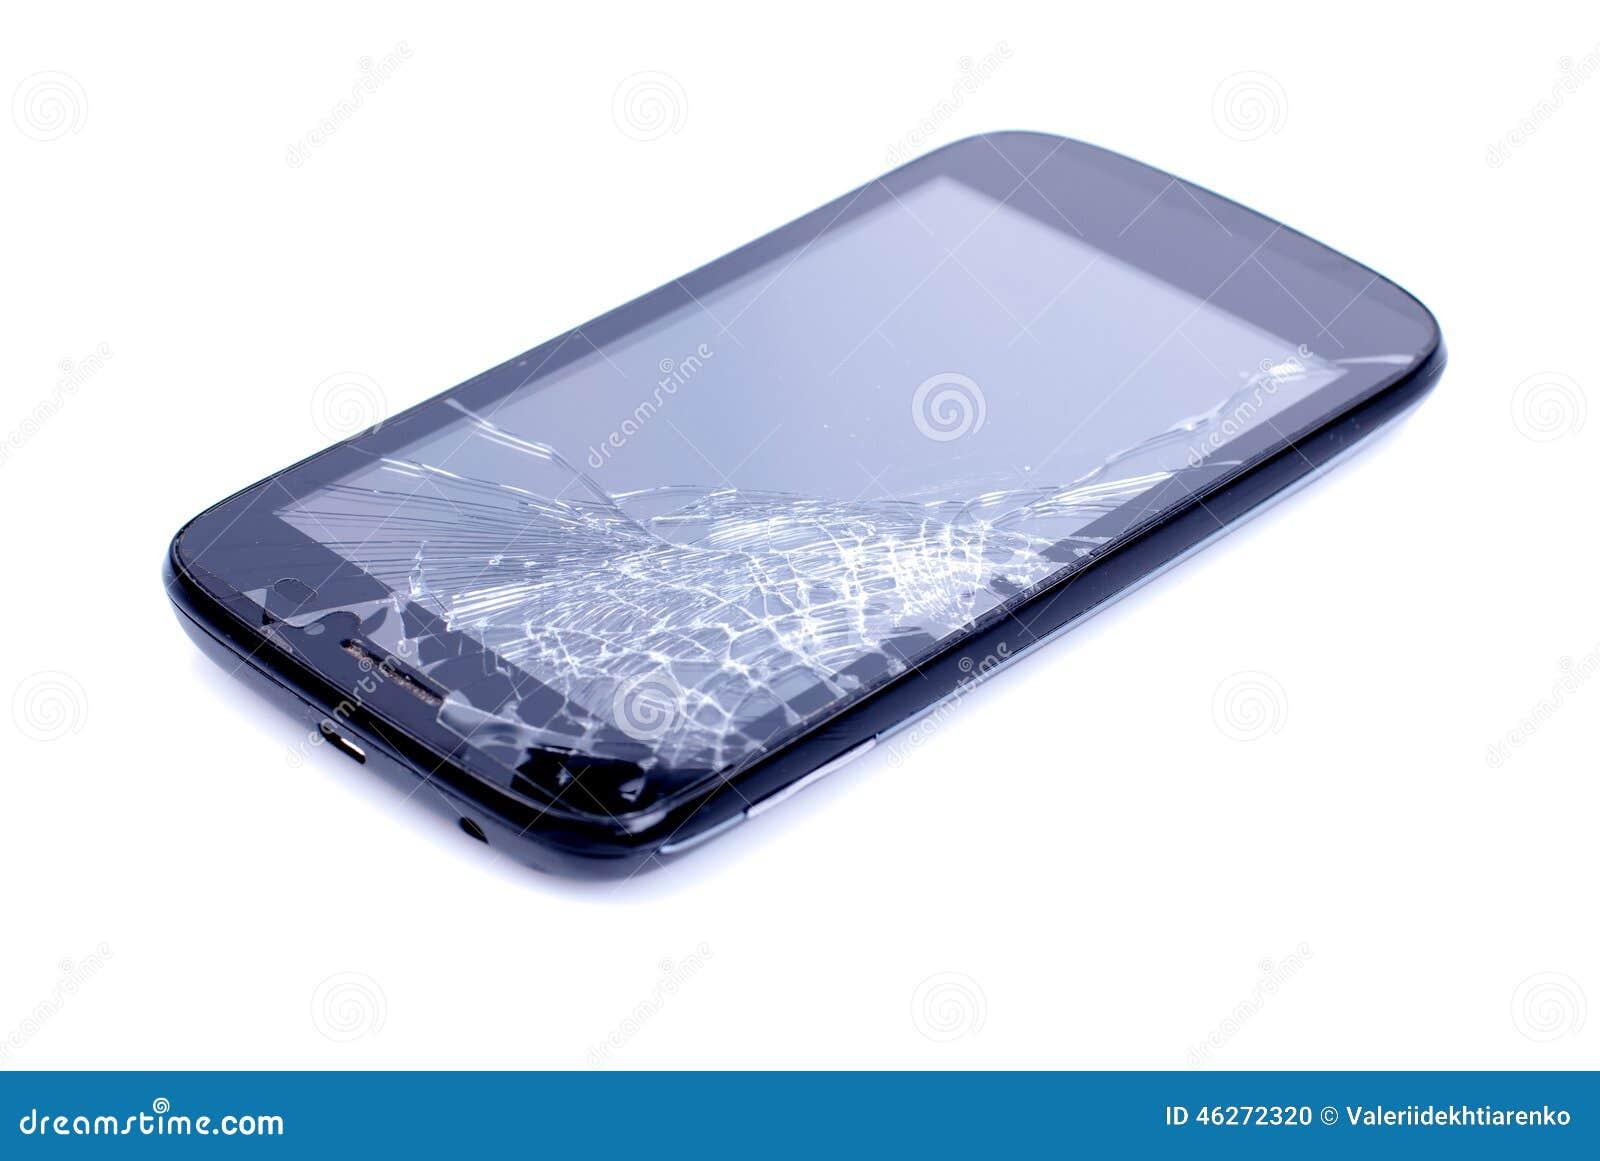 Teléfono móvil negro con una pantalla quebrada en un backgroun aislado